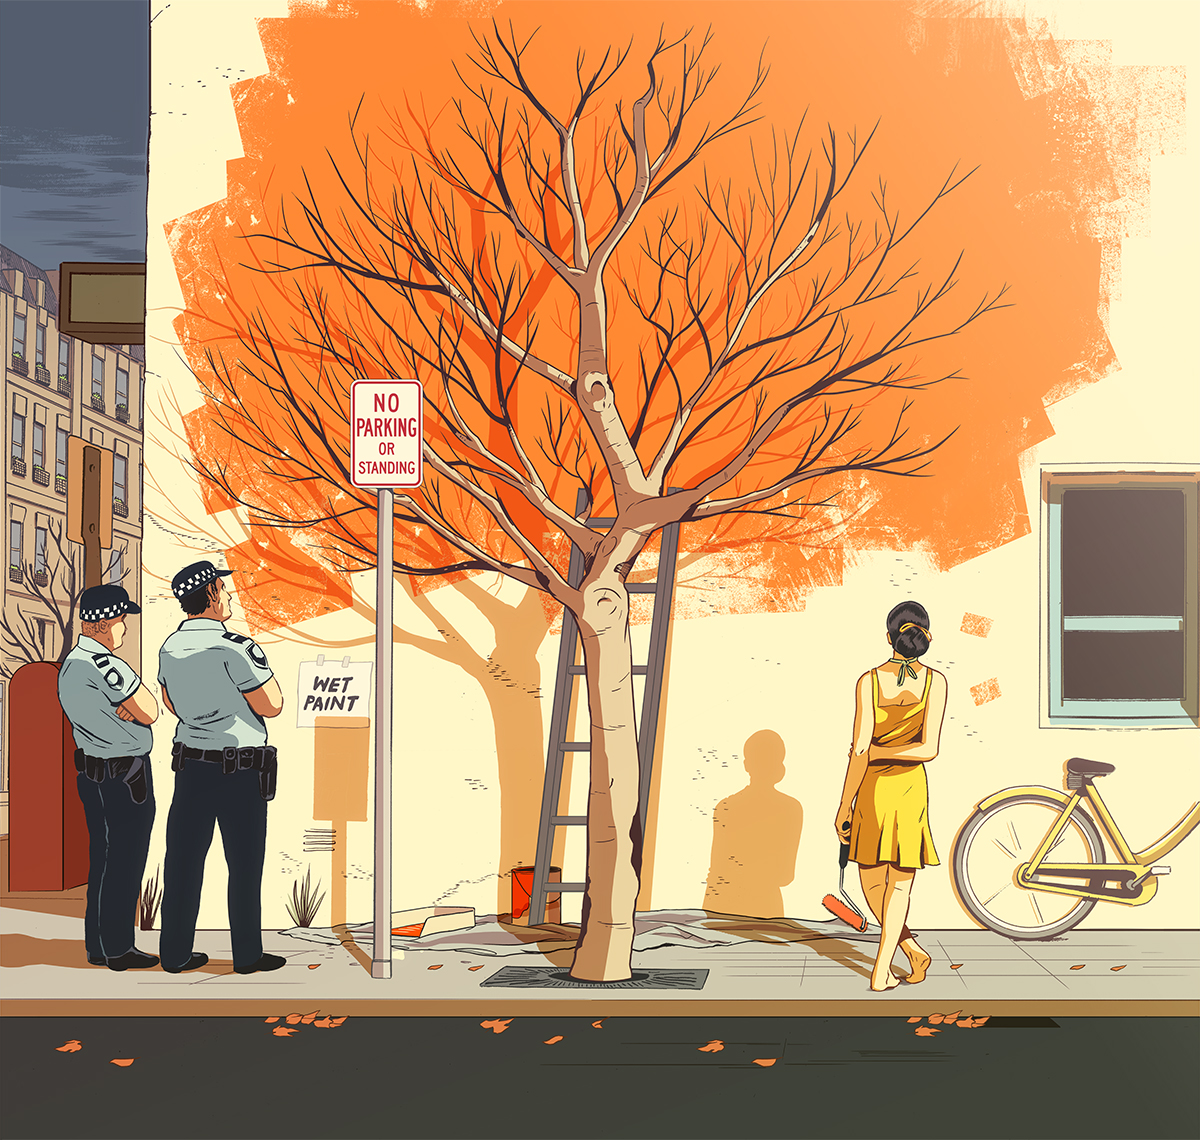 guy-shield-illustration-03